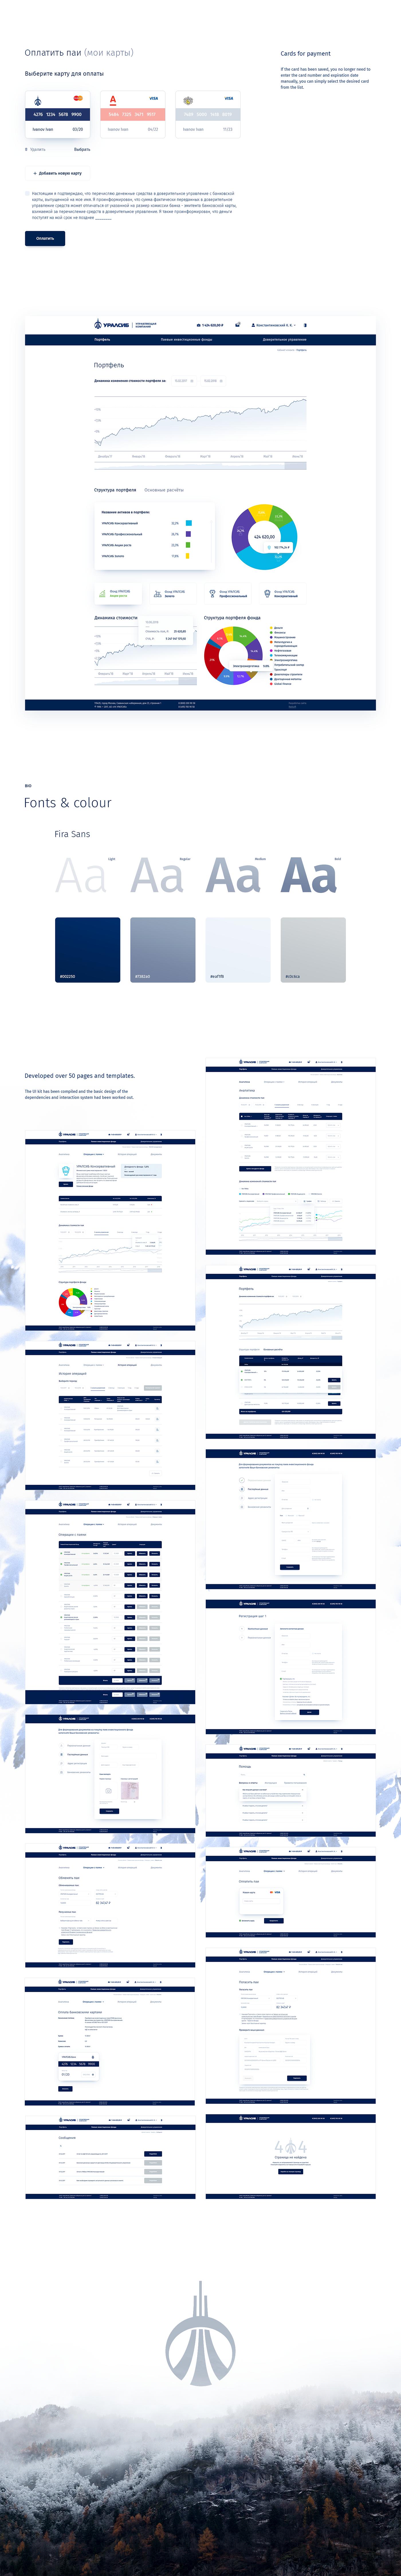 Bank Uralsib UI ux Webdesign design dashboard interaction personal area